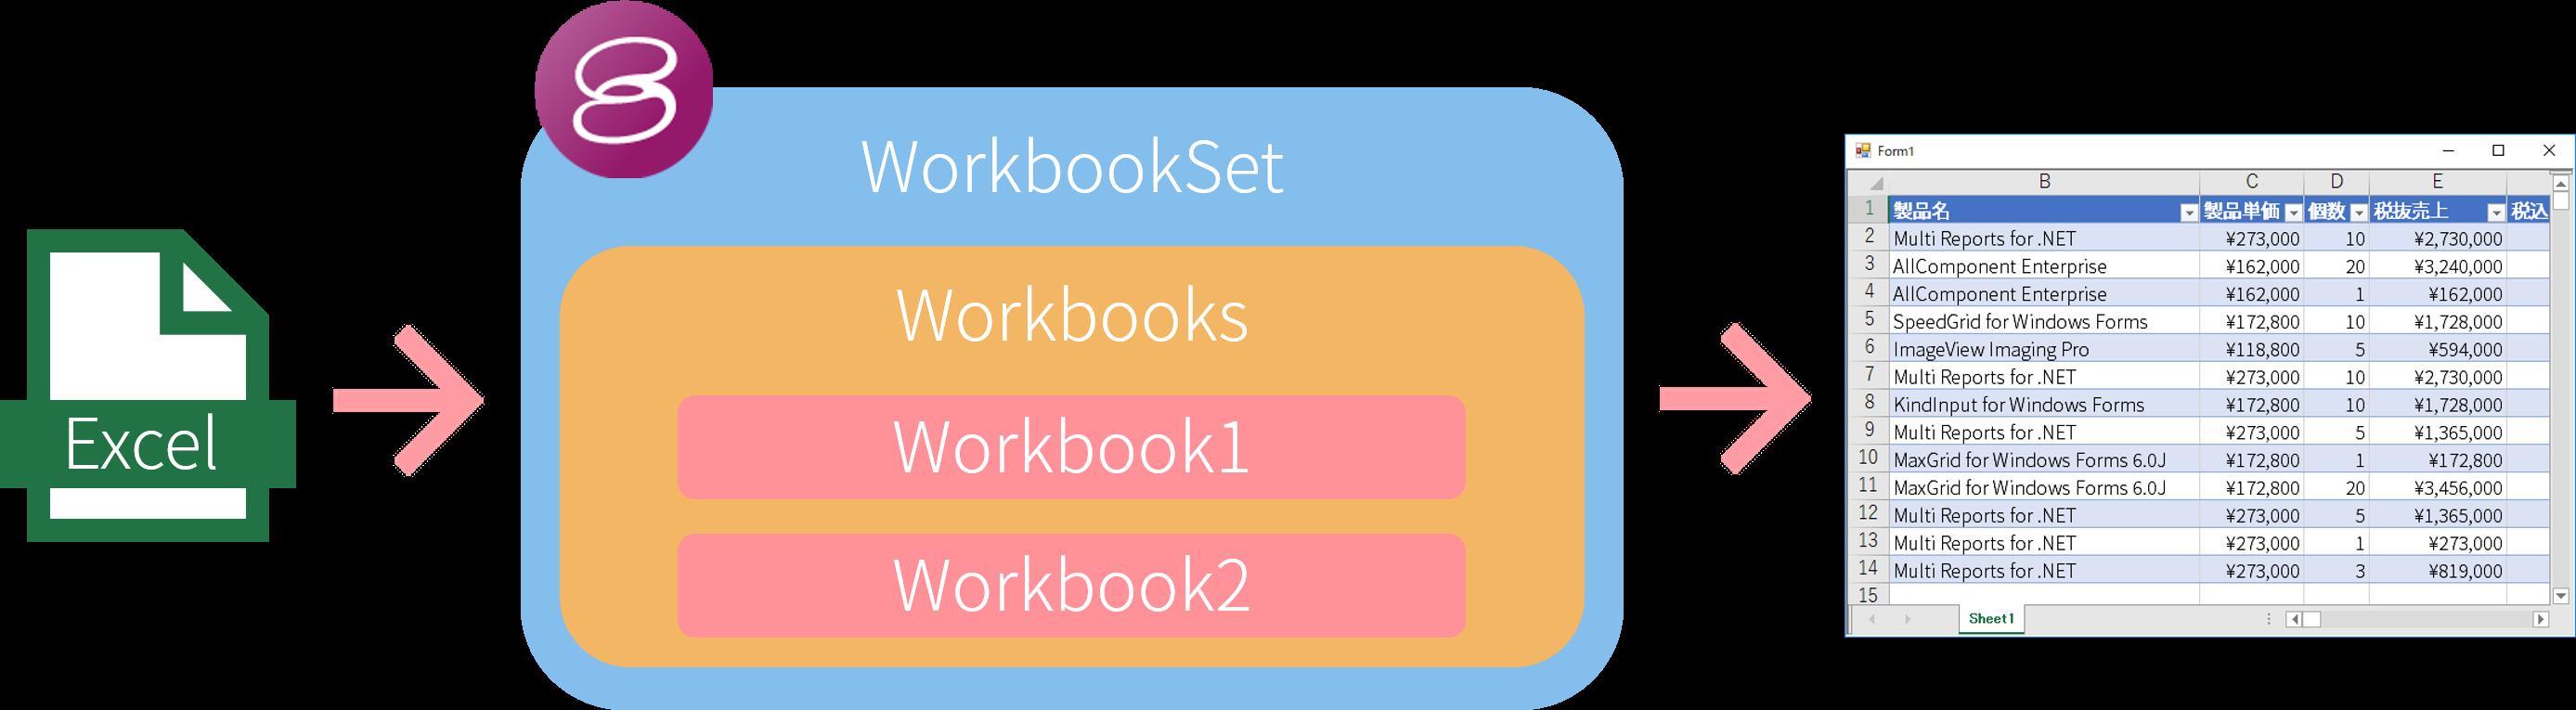 IWorkbookSetインタフェースでExcelとの連携強化